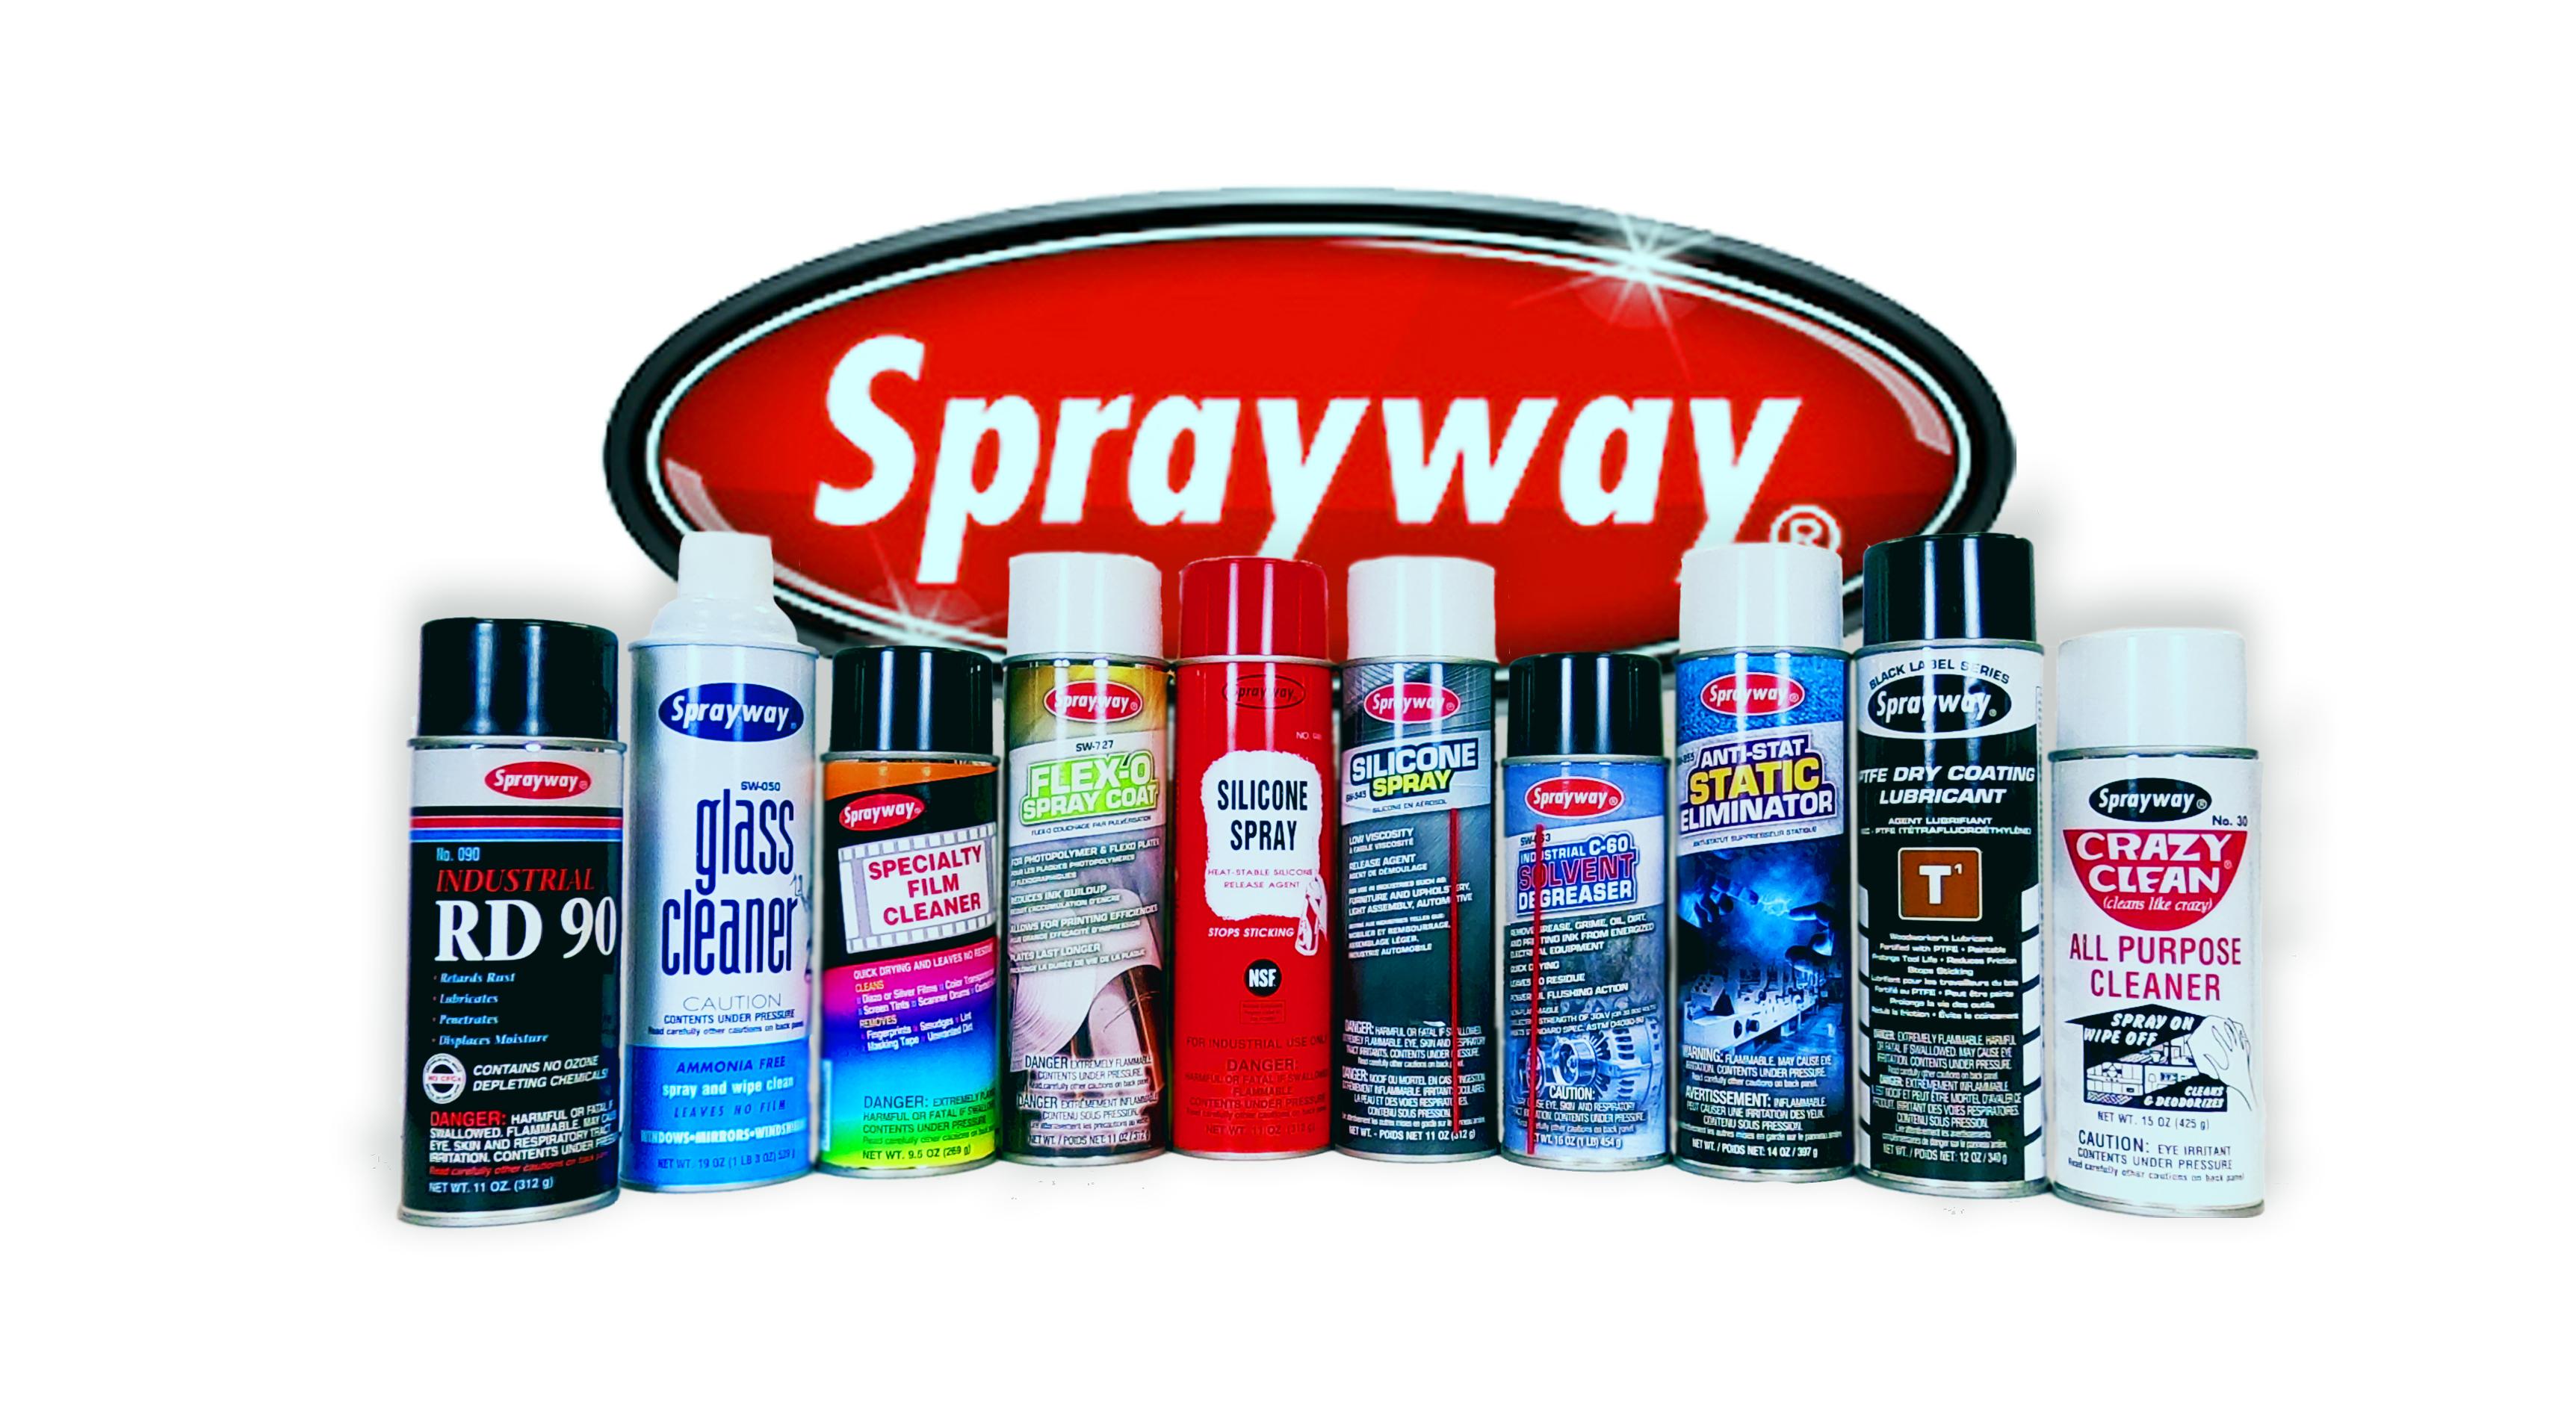 Sprayway Product